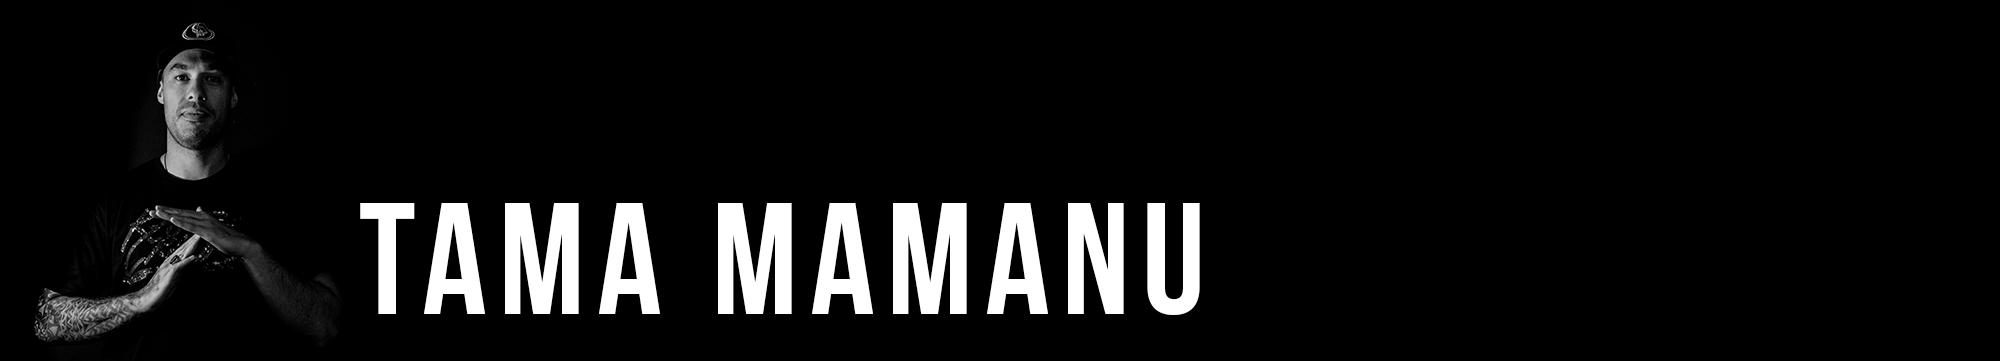 tama-title.png